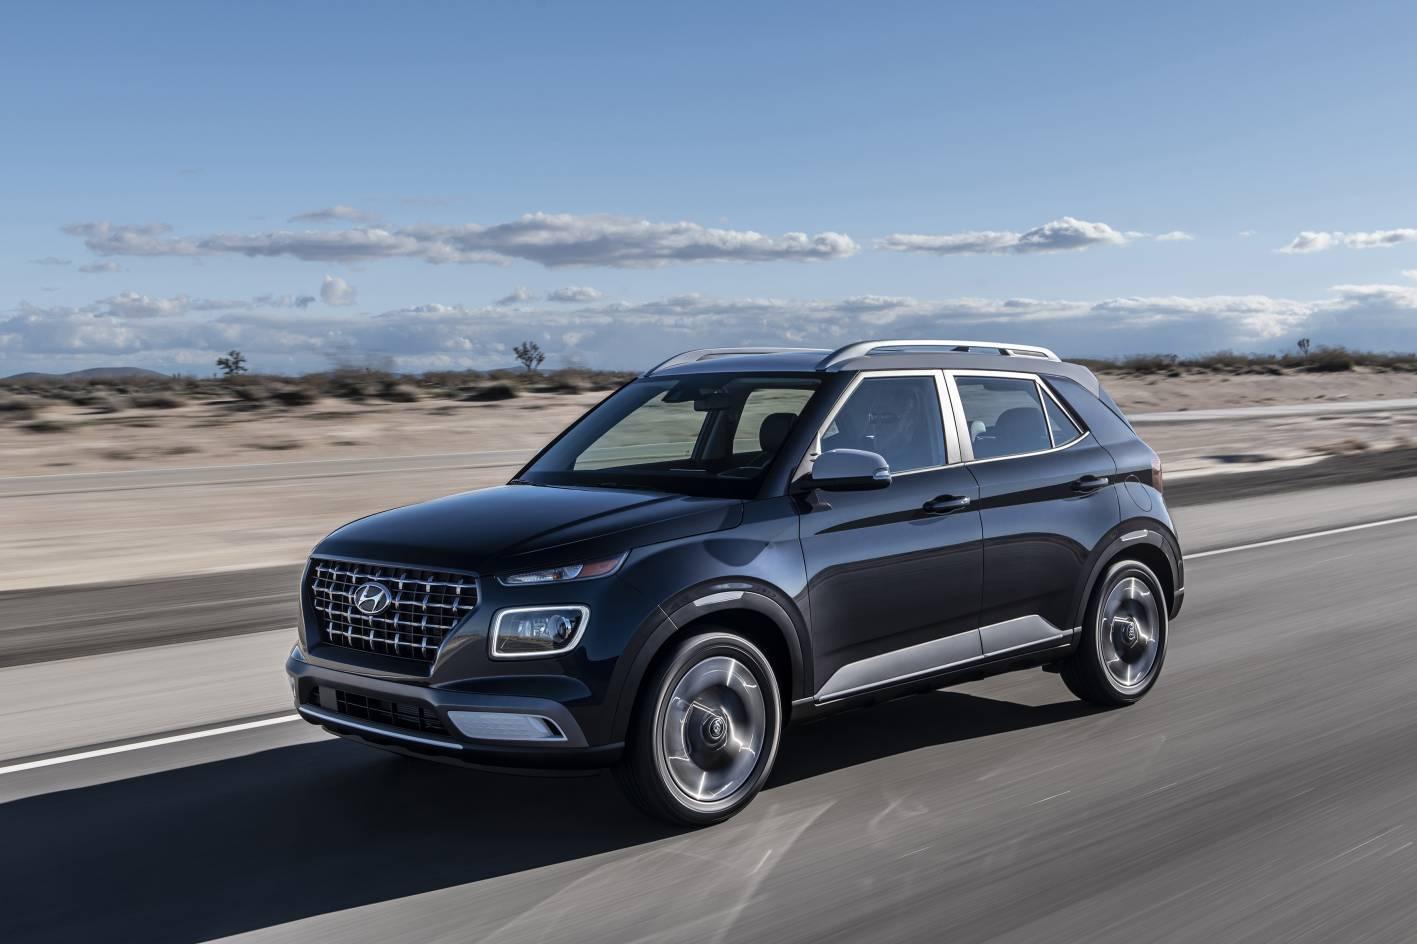 Hyundai launches a new compact SUV – the Venue